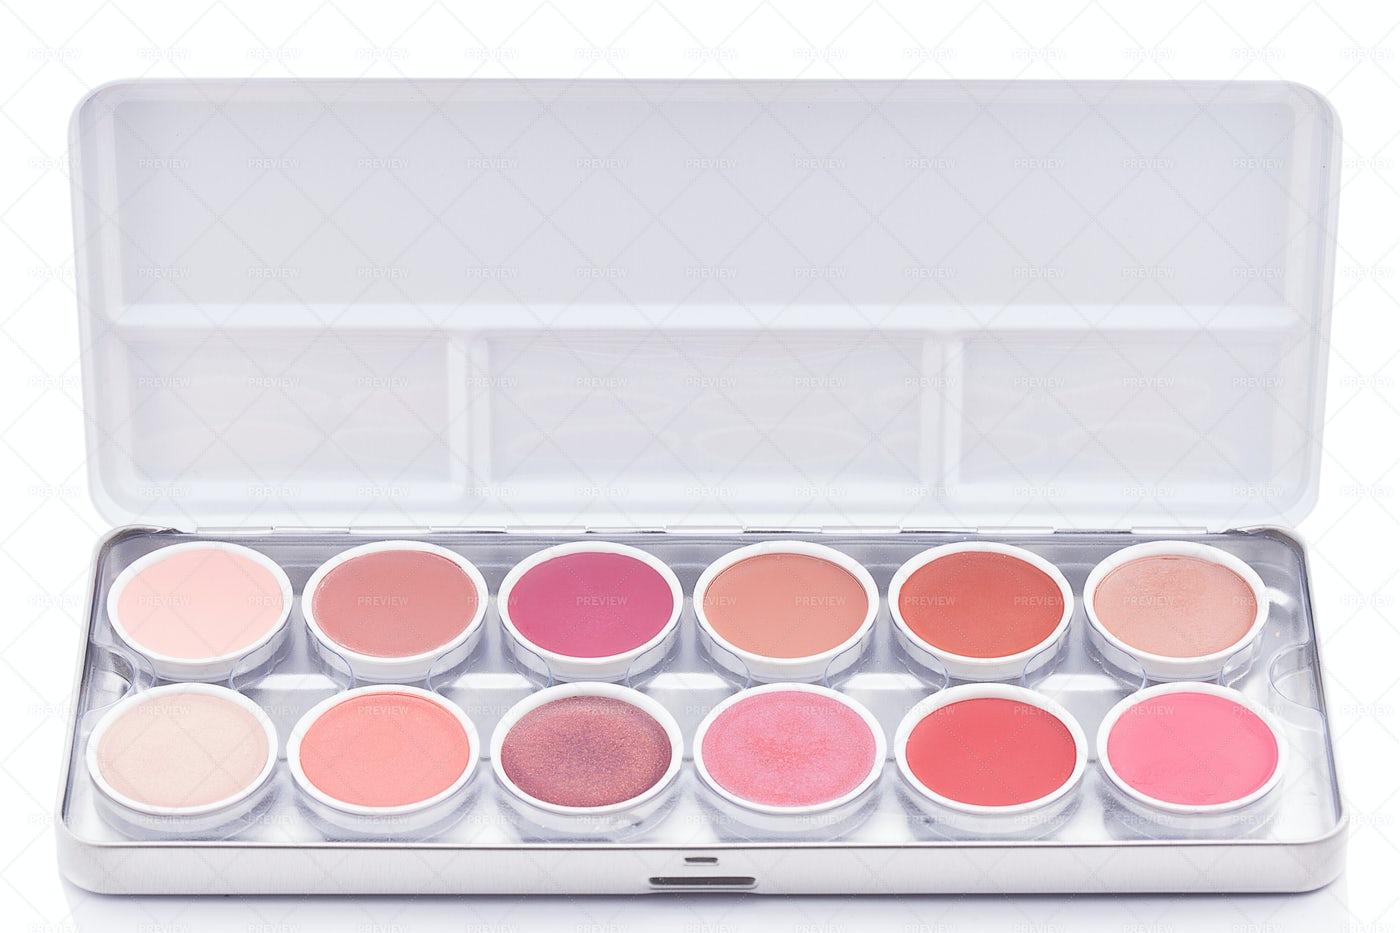 Pink Eyeshadow Palette: Stock Photos